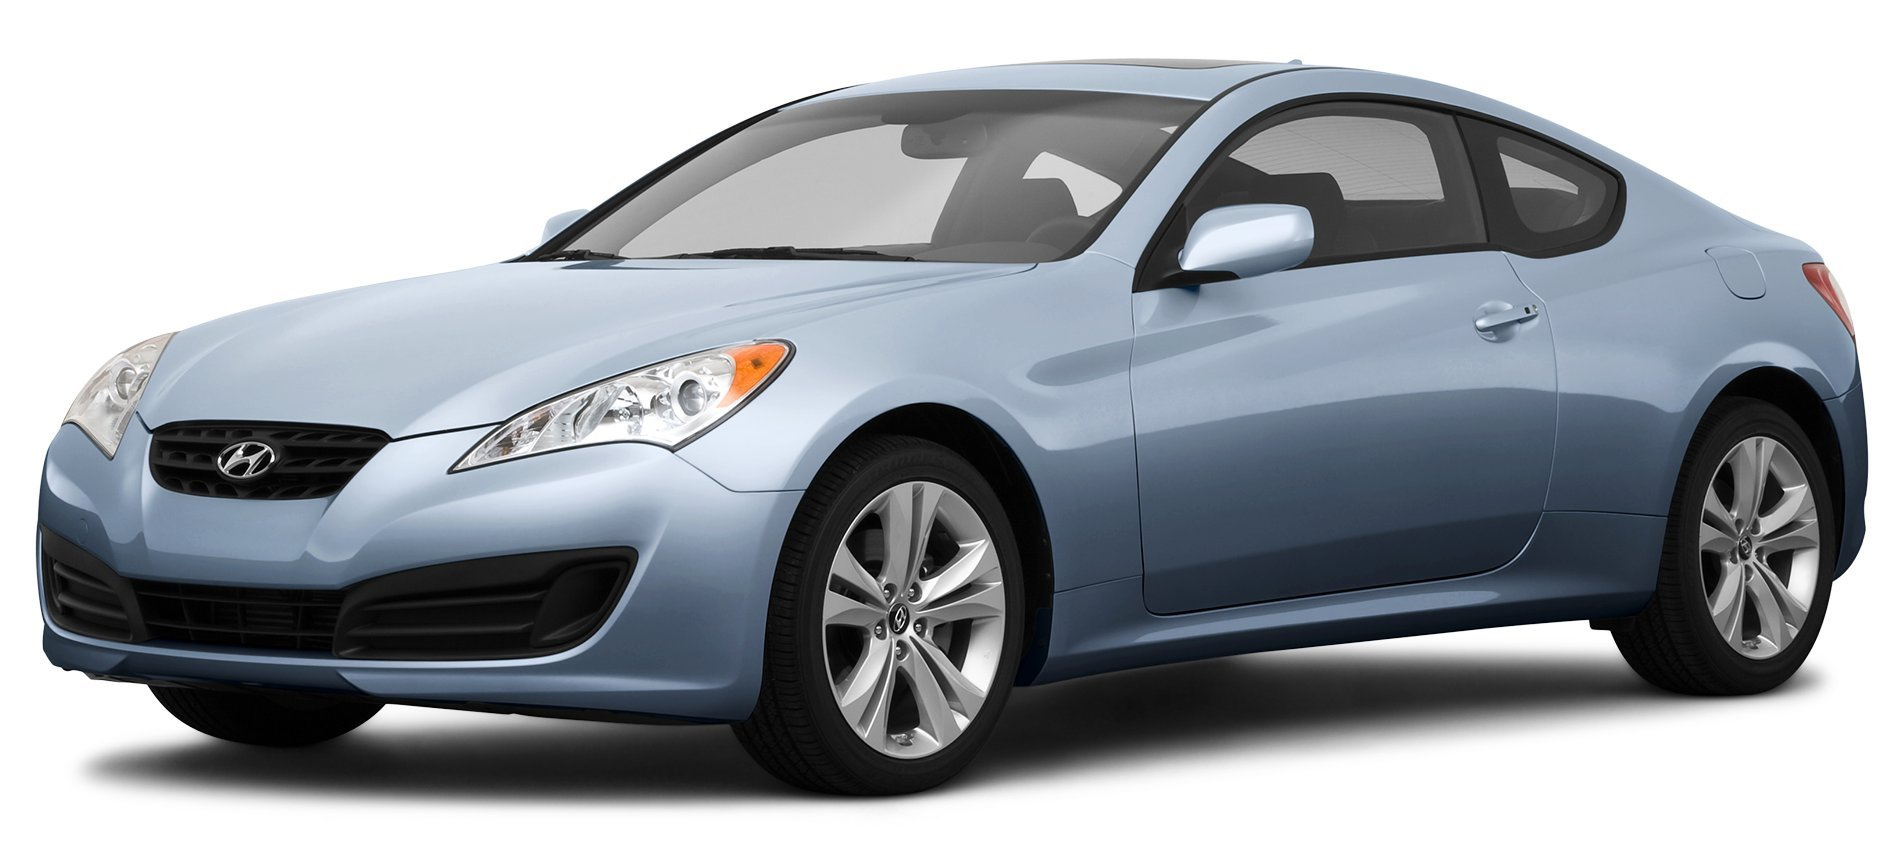 Beautiful 2010 Hyundai Genesis Coupe, 2 Door 2.0T Automatic Transmission ...